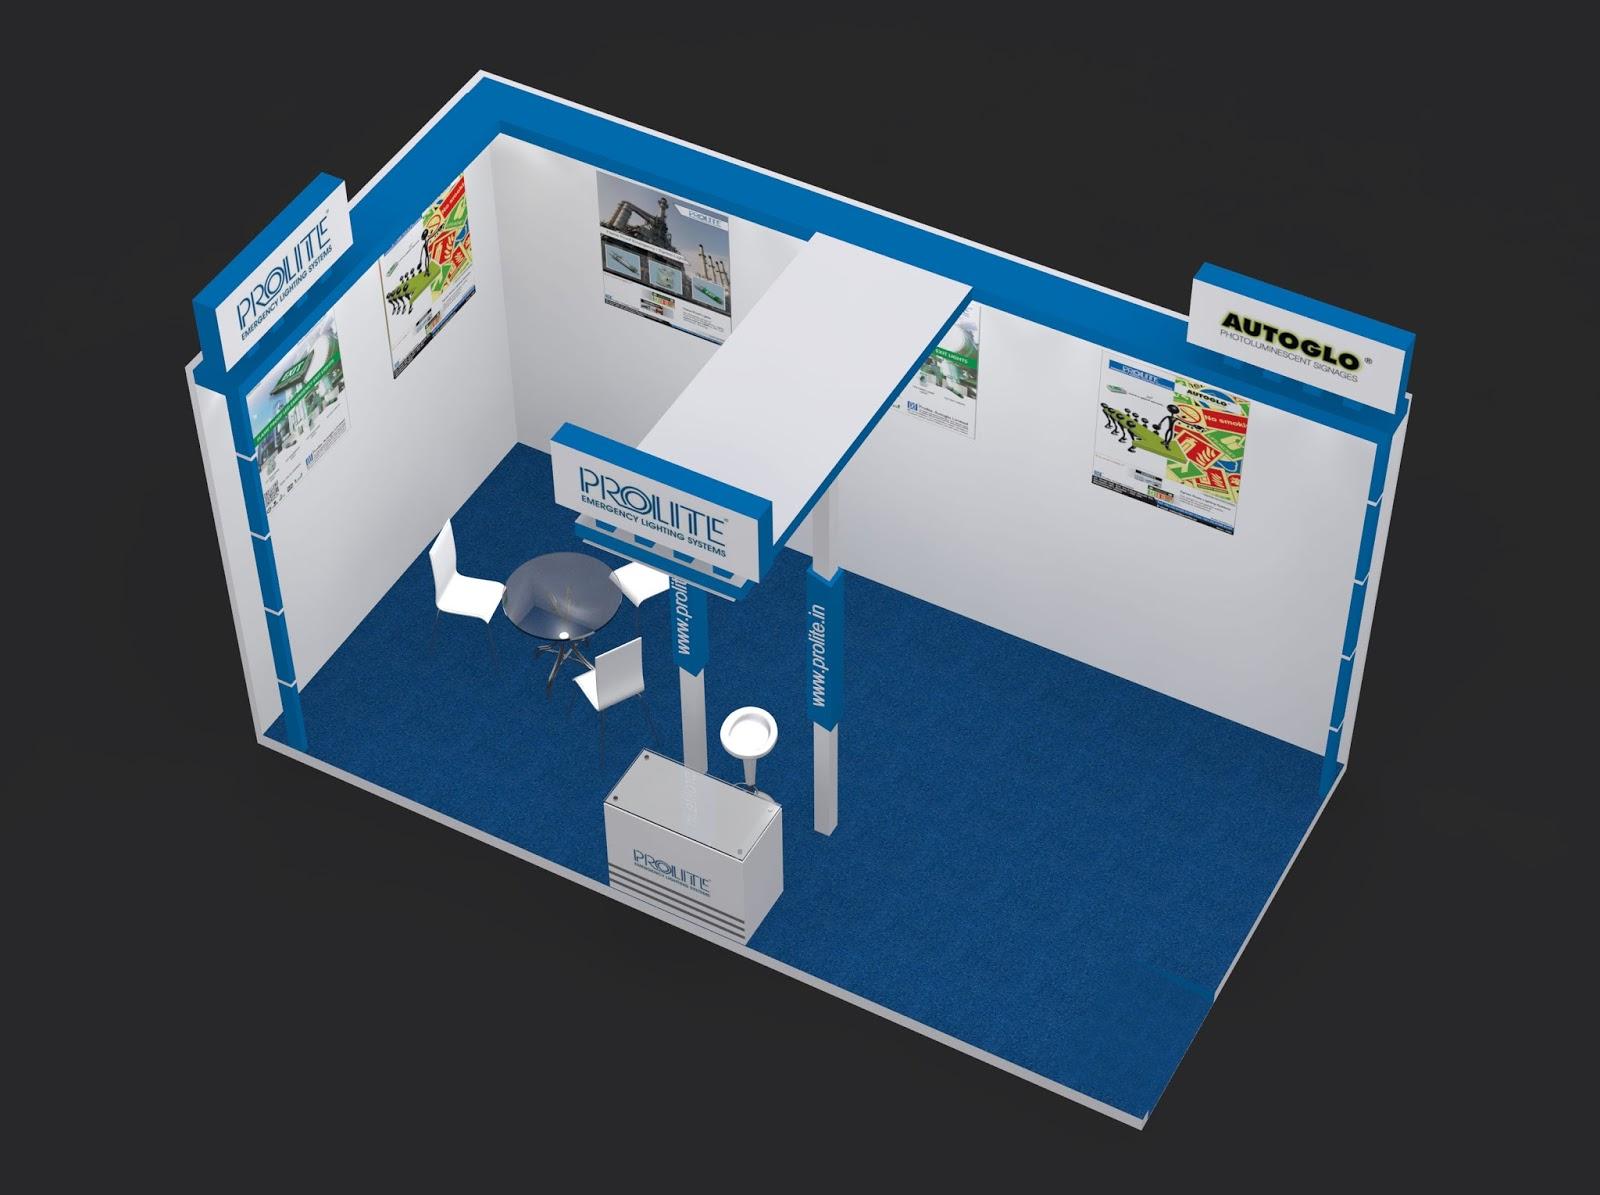 Saravanan designs prolite autoglo stall designs 4m x 3m for Bathroom ideas 3m x 3m